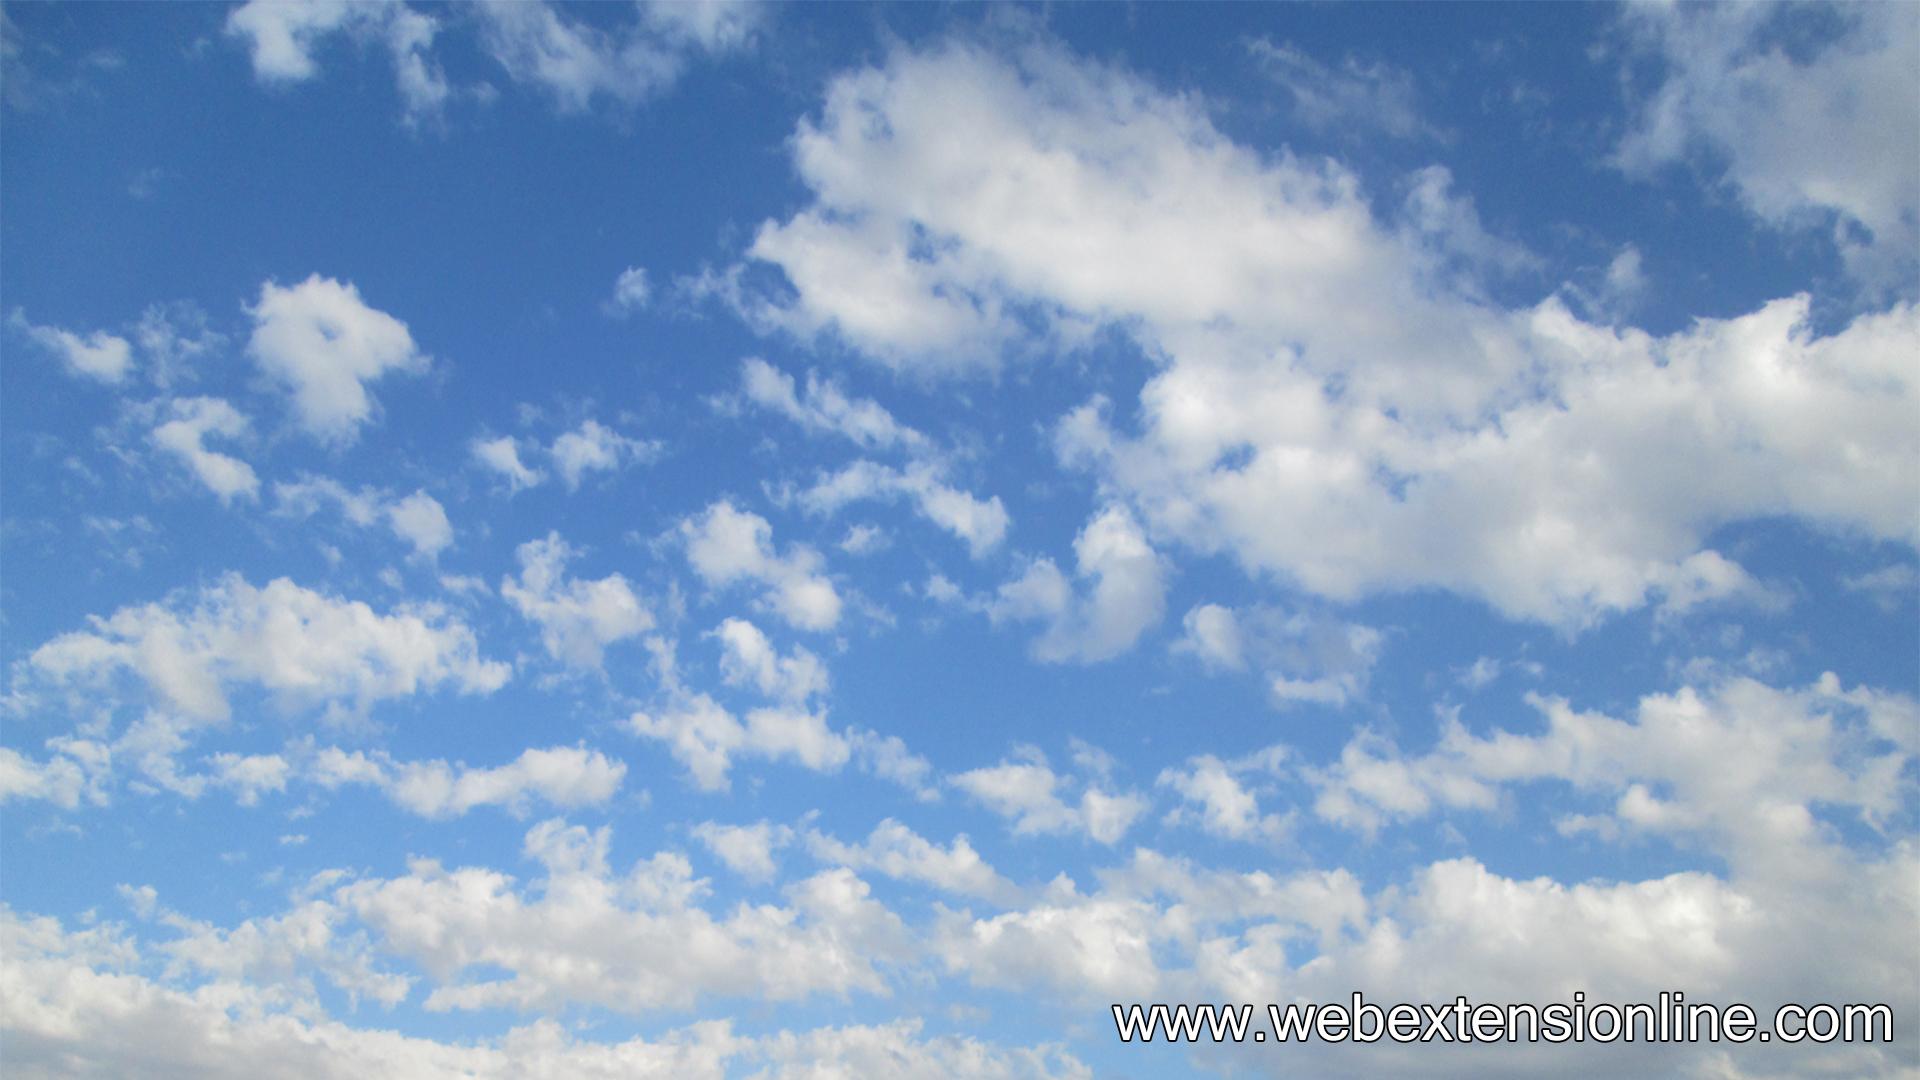 Wallpapers Development Tips Joomla wordpress SEO HD Blue Sky 1920x1080